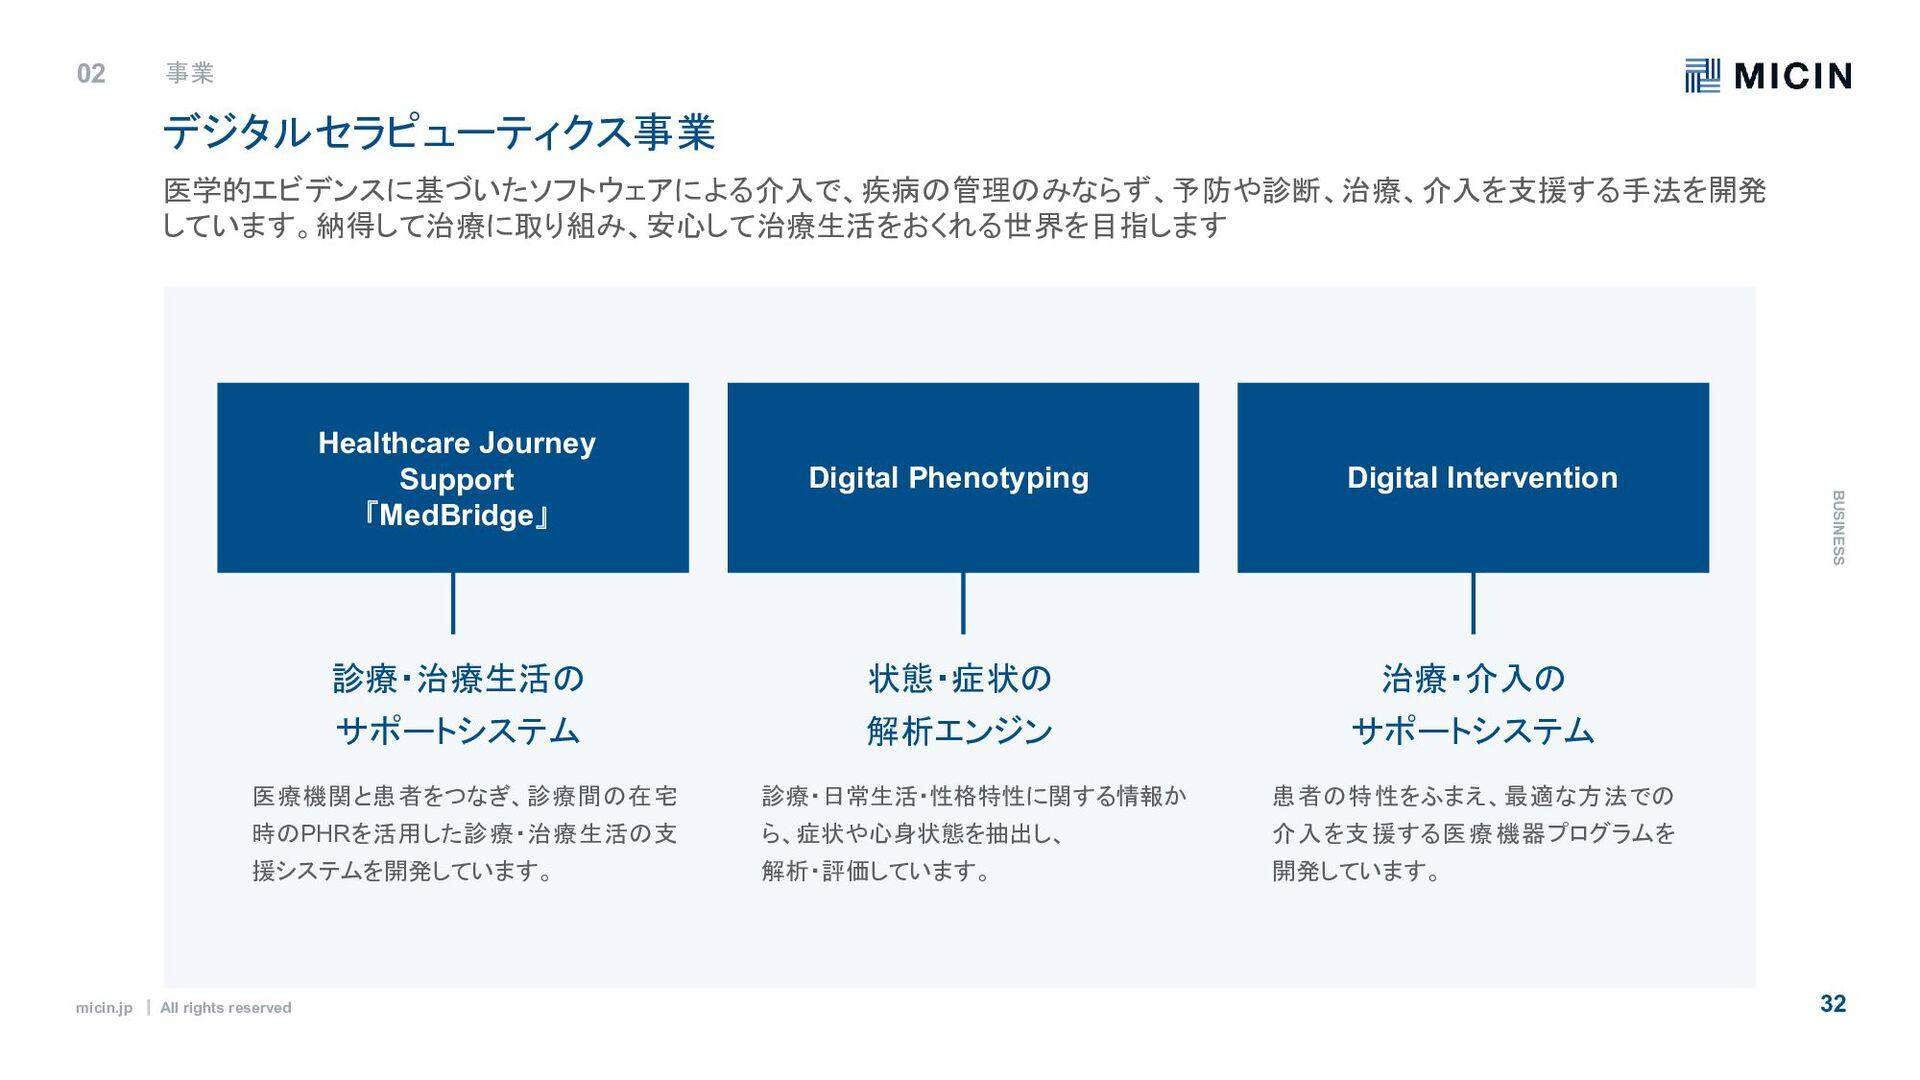 micin.jp ʛ All rights reserved 32 த్ೖࣾऀͷओͳग़اۀ ...